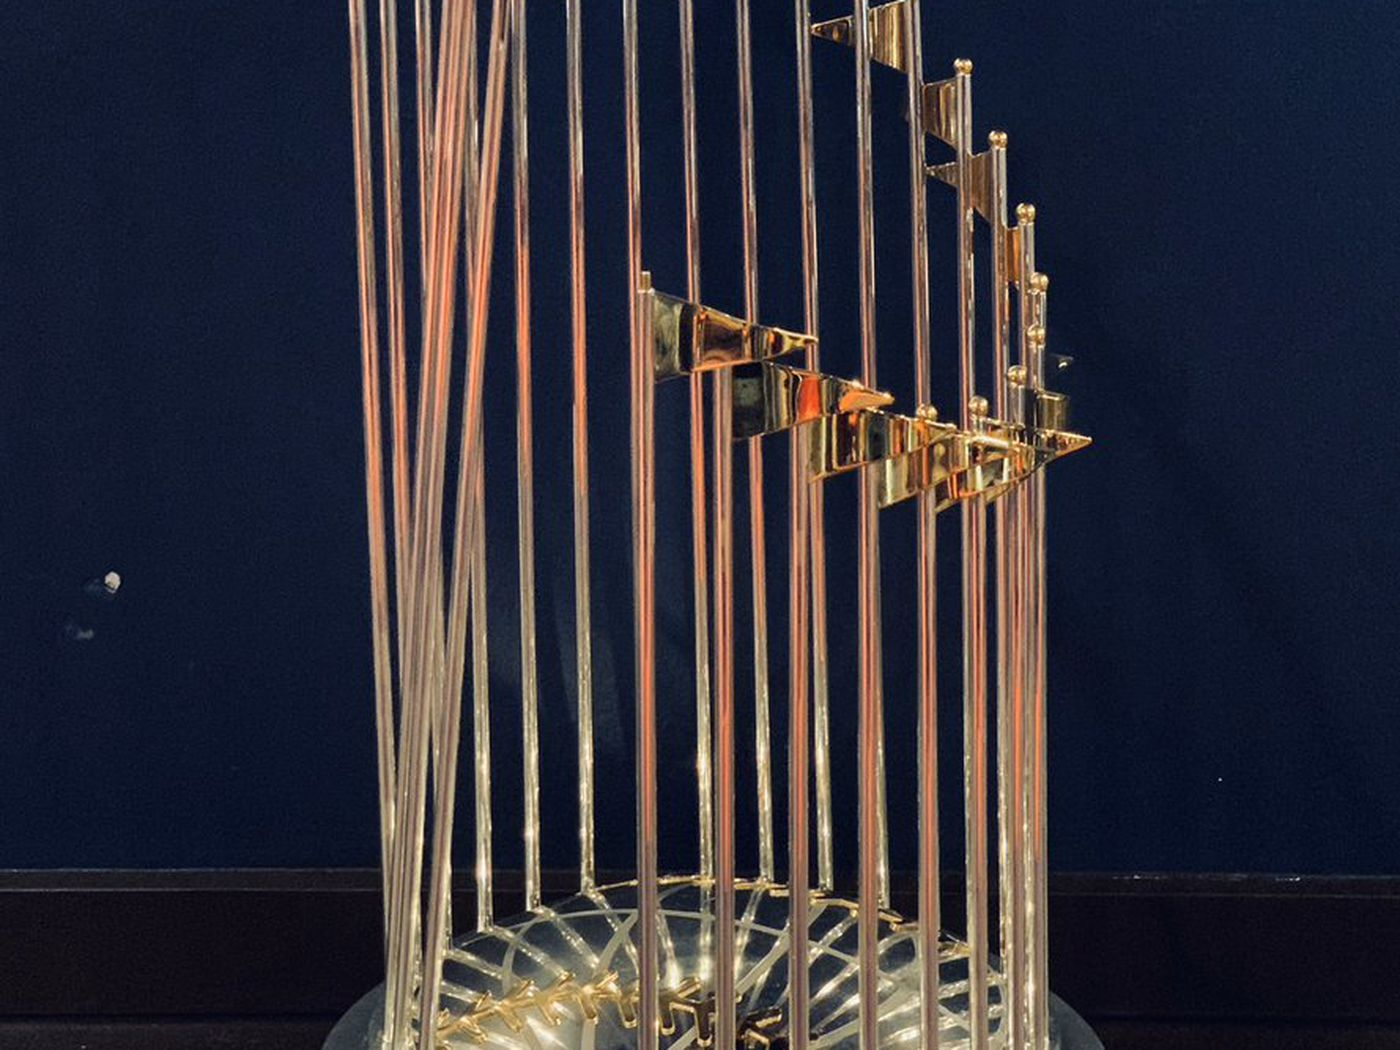 Nationals World Series Parade Will The Trophy Be Broken Sbnation Com